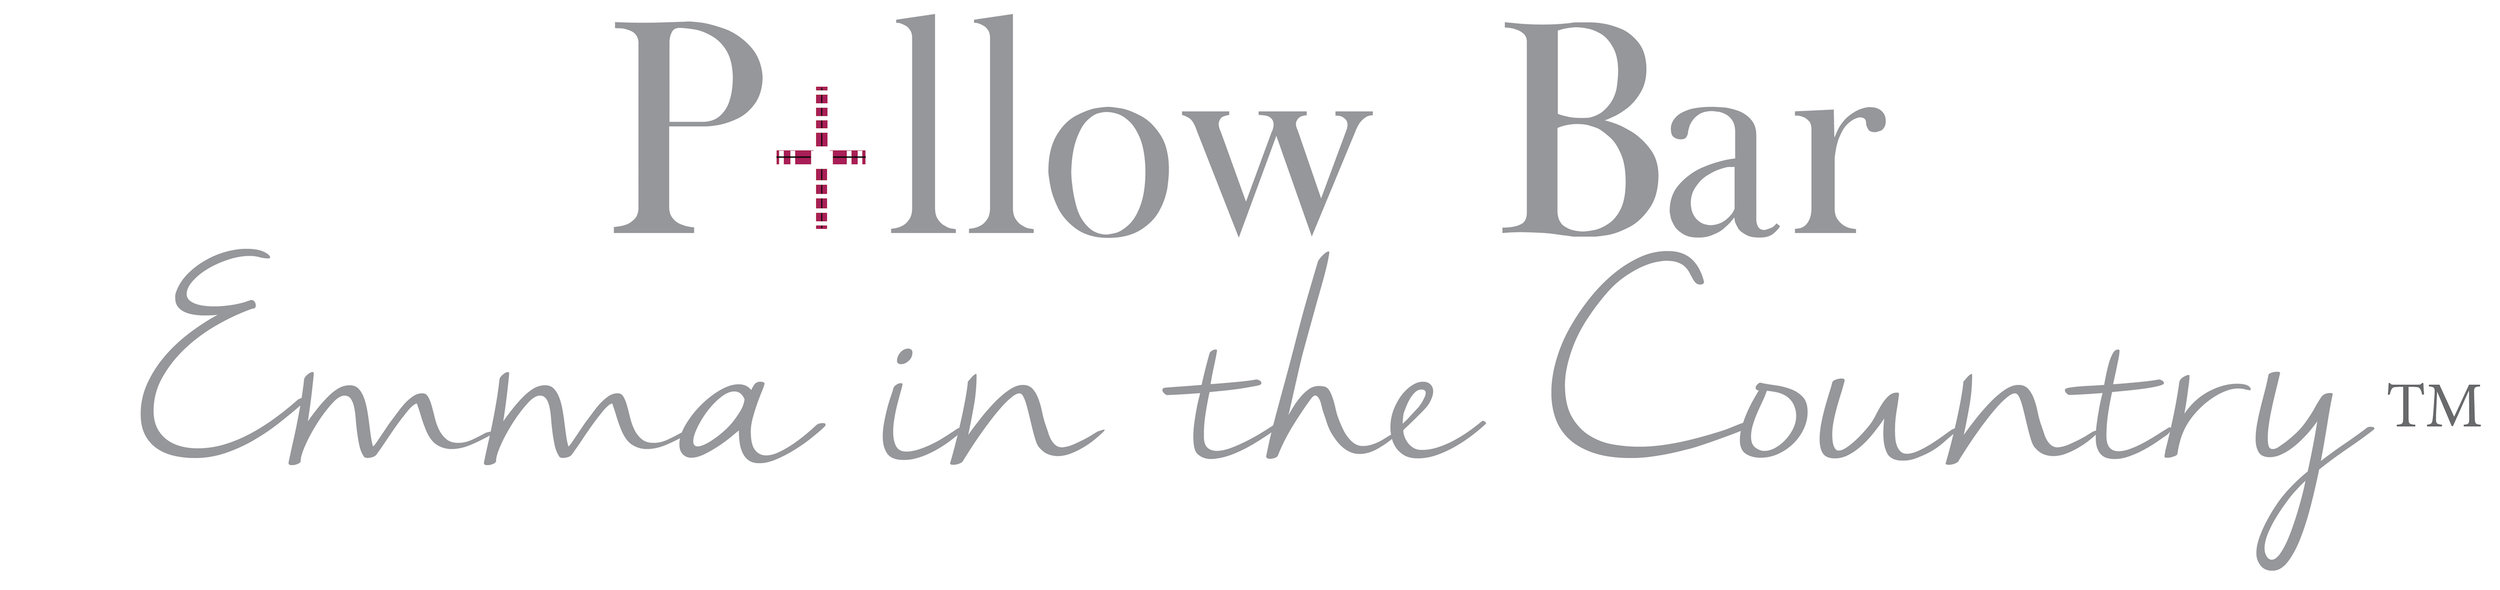 emma-pillowbar-logo.jpg